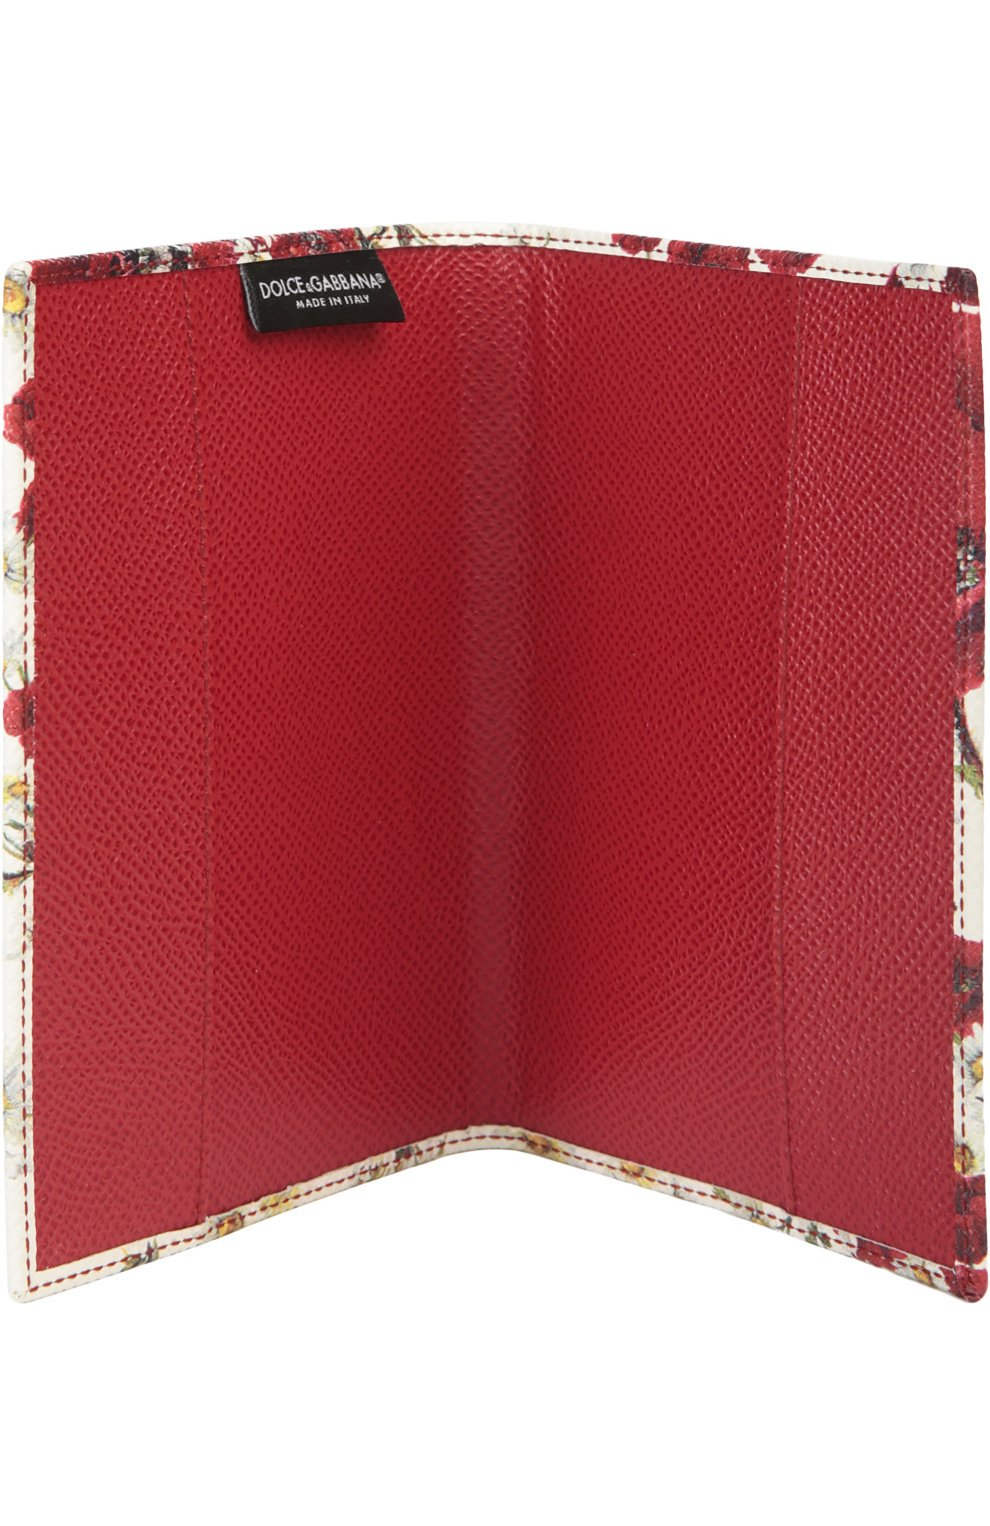 Обложка Dolce & Gabbana красного цвета | Фото №4